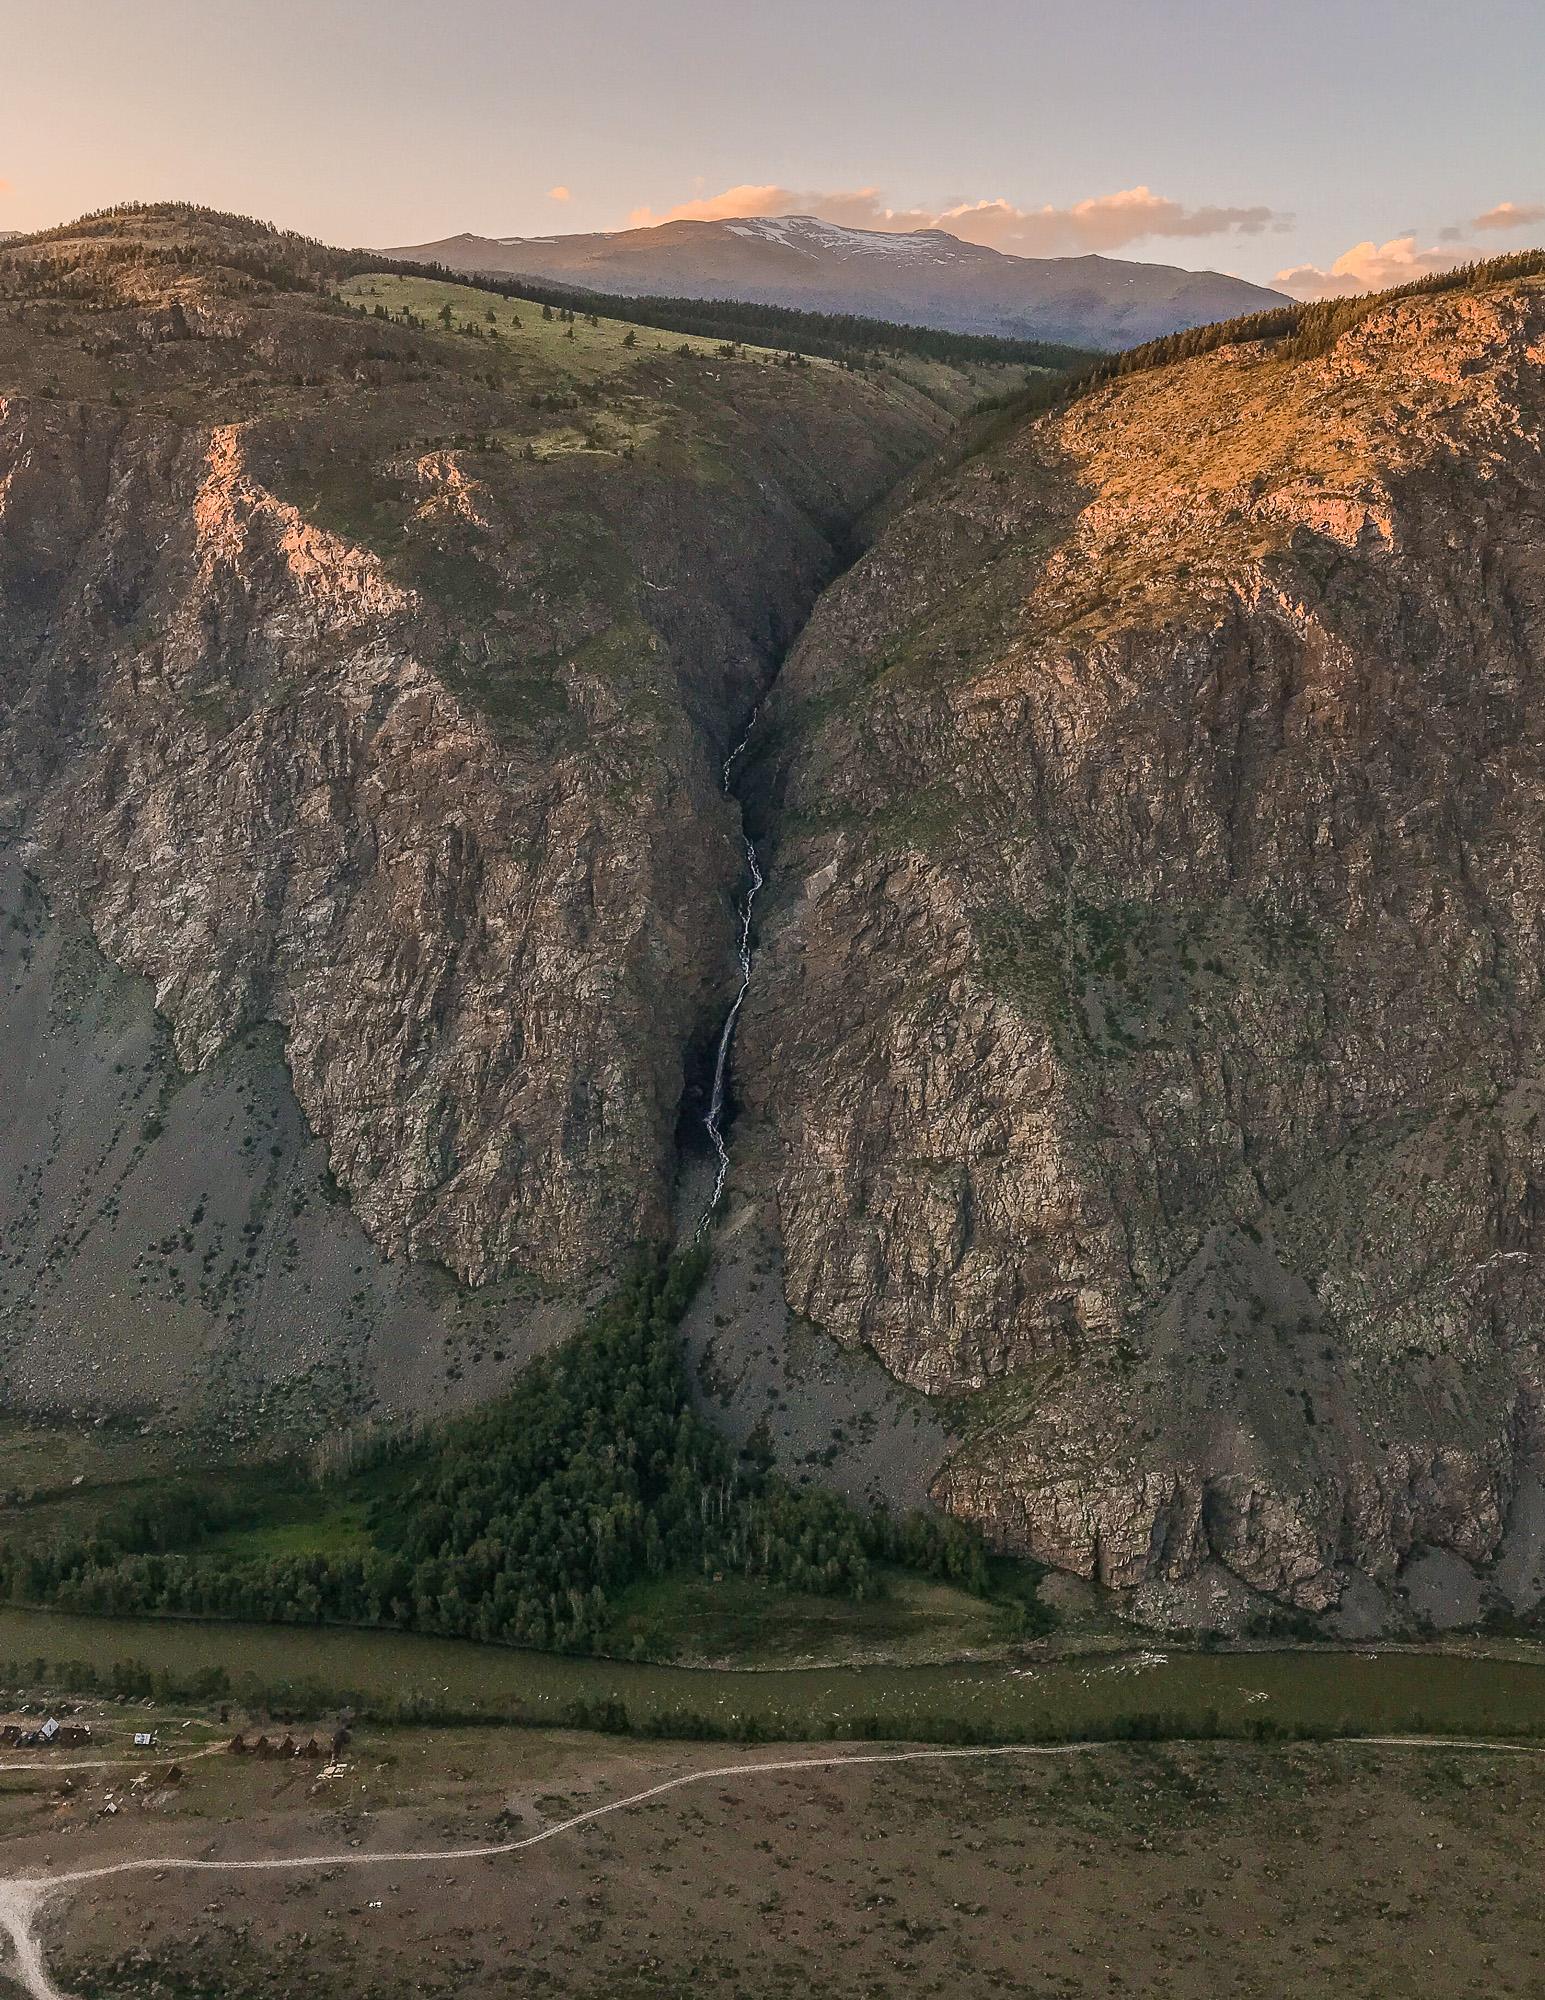 Katy-Yaryk-Altai-Republic-Кату-Ярык-Алтай-3692